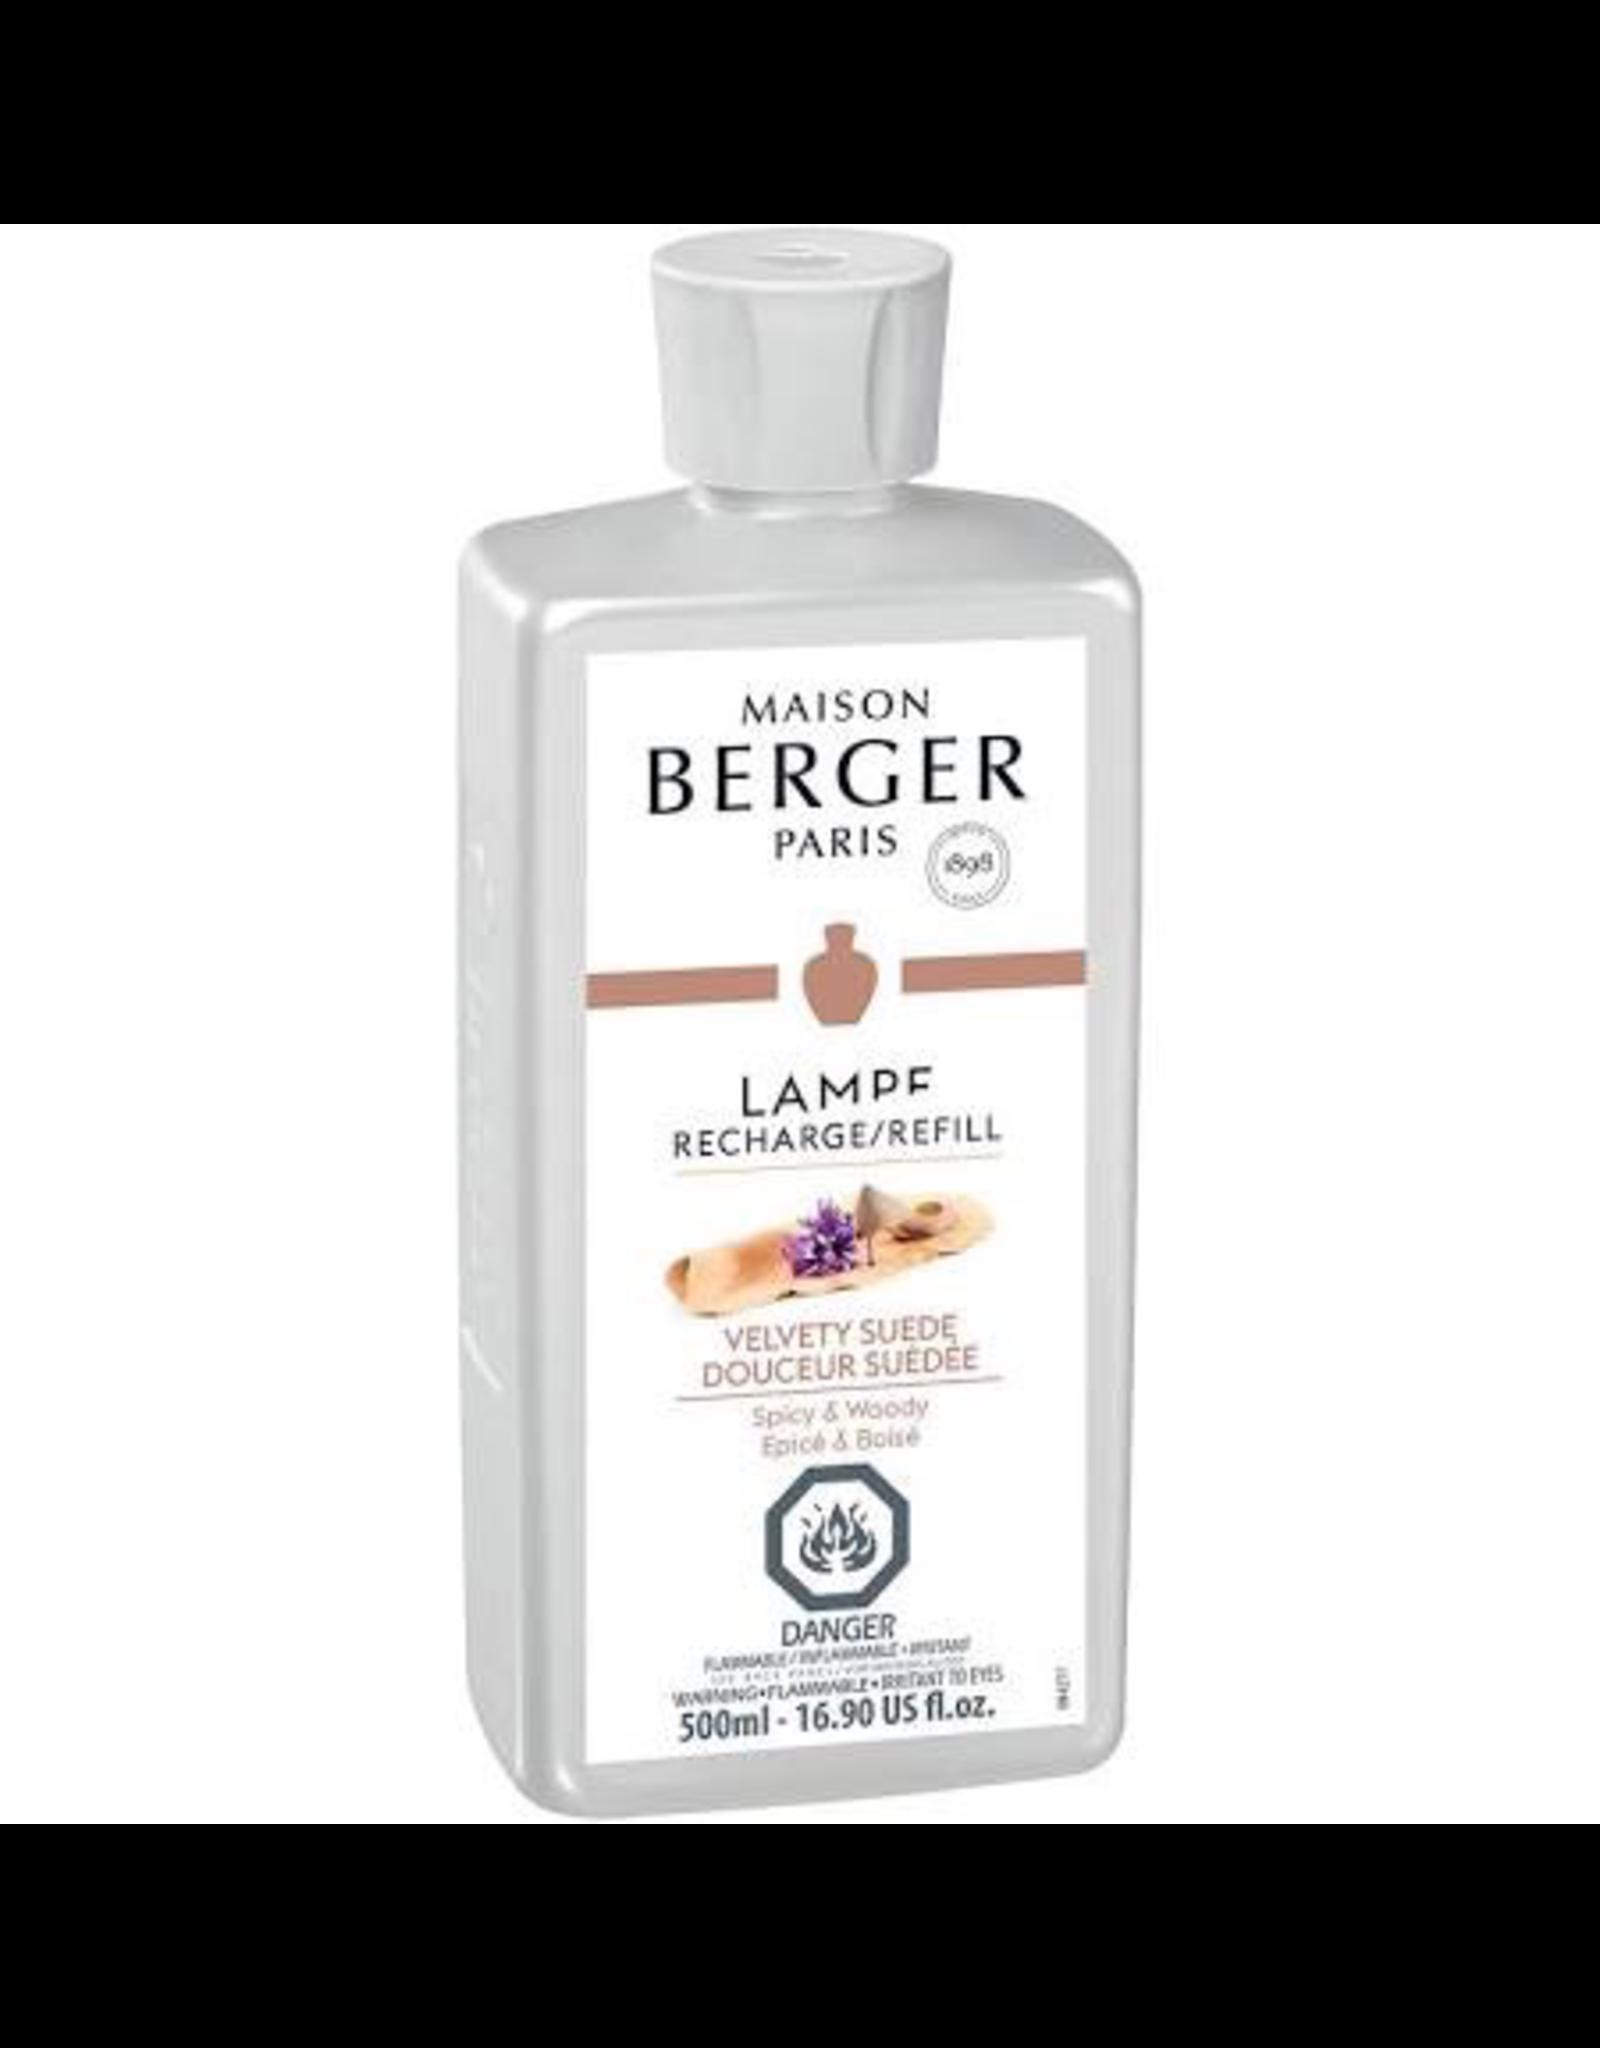 Maison Berger Velvety Suede 500 ml